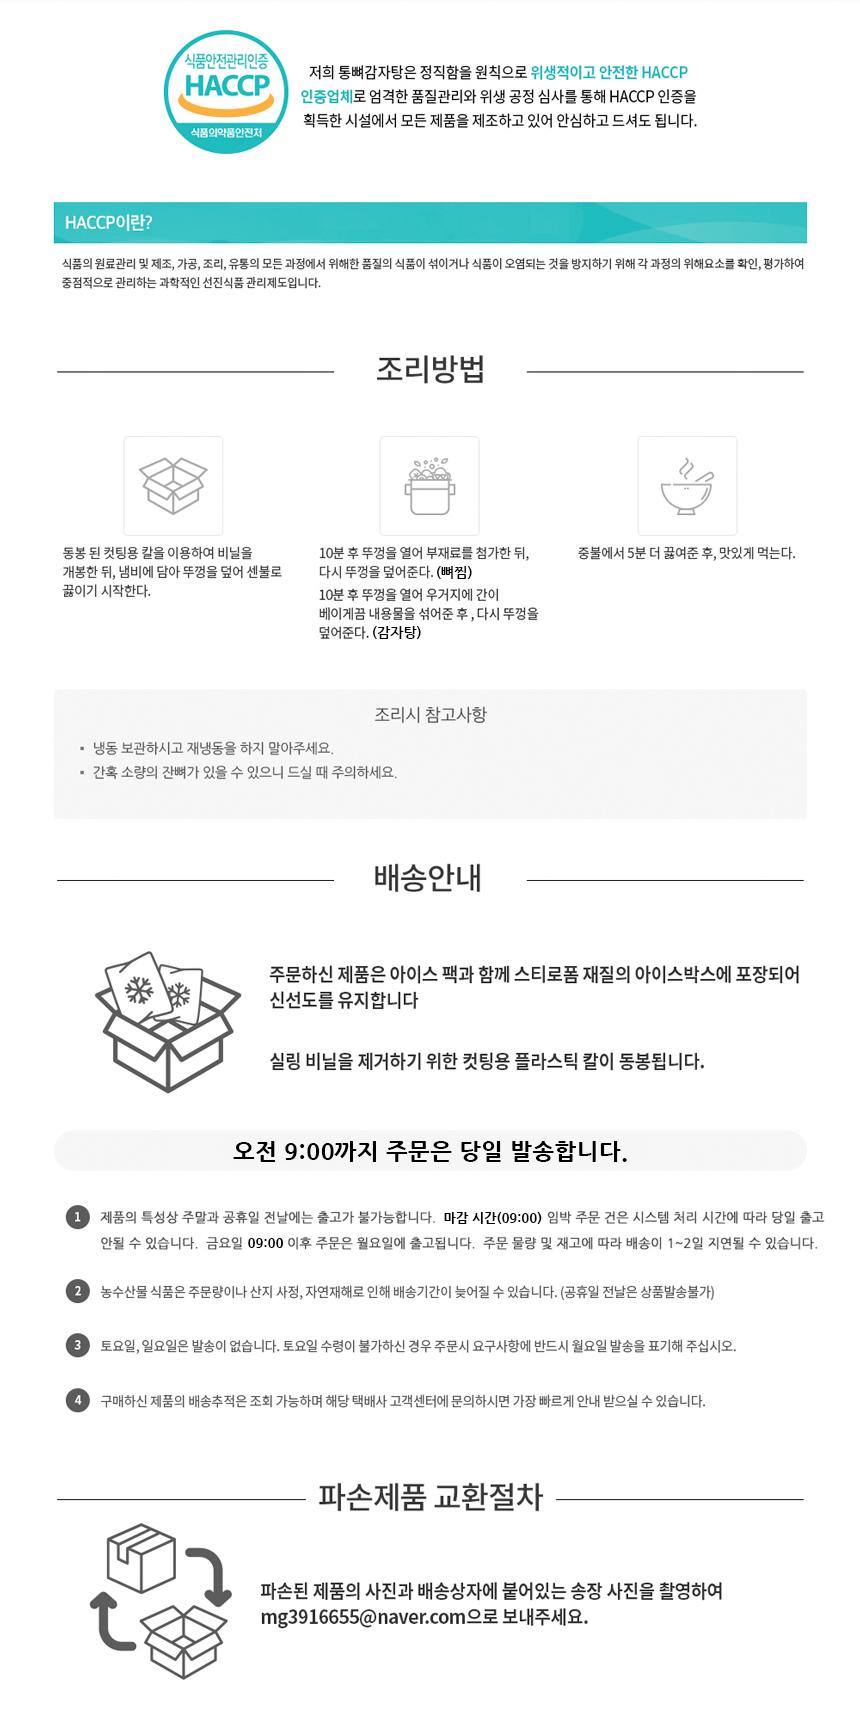 myeongga_info01.jpg